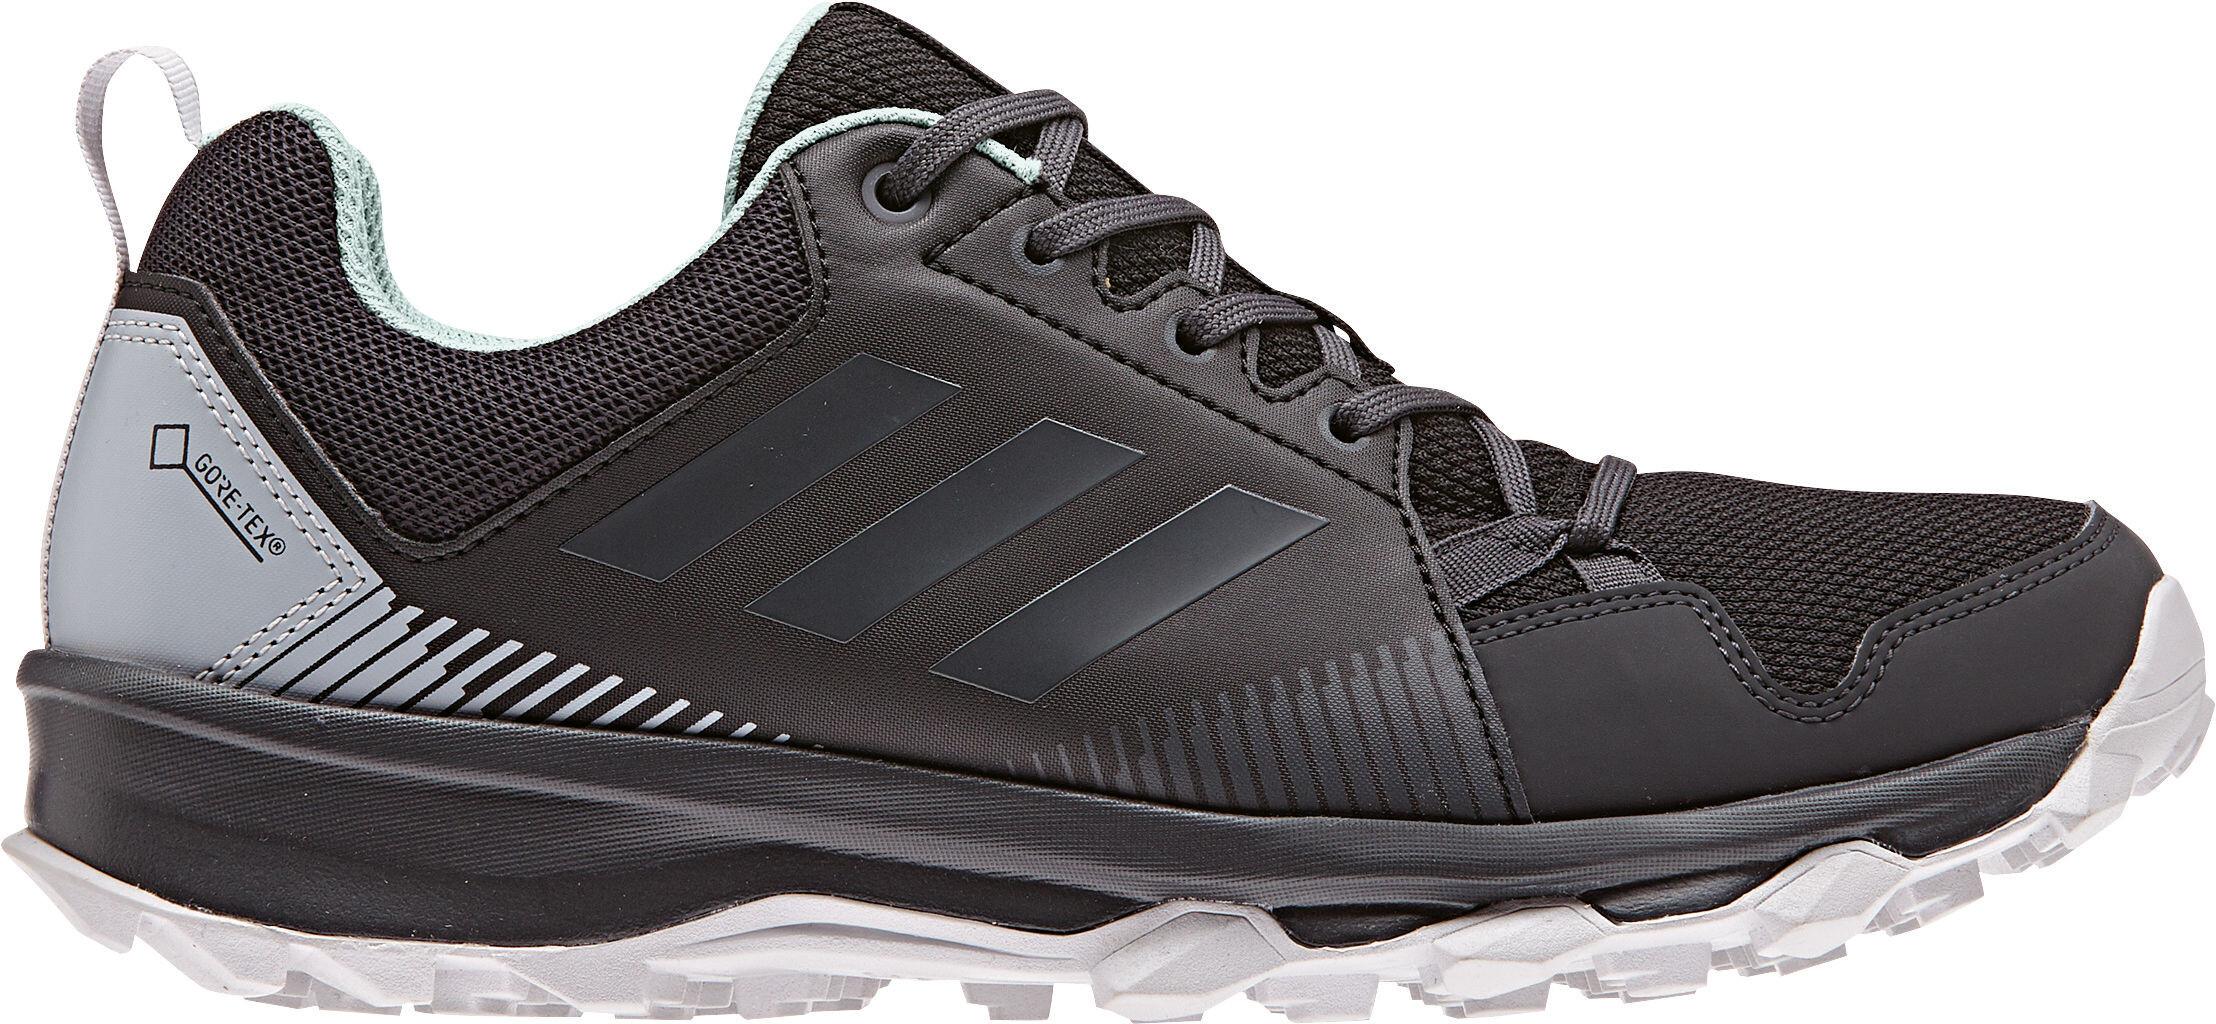 30e24cbfd6aca adidas TERREX TraceRocker GTX Running Shoes Women black at Bikester ...